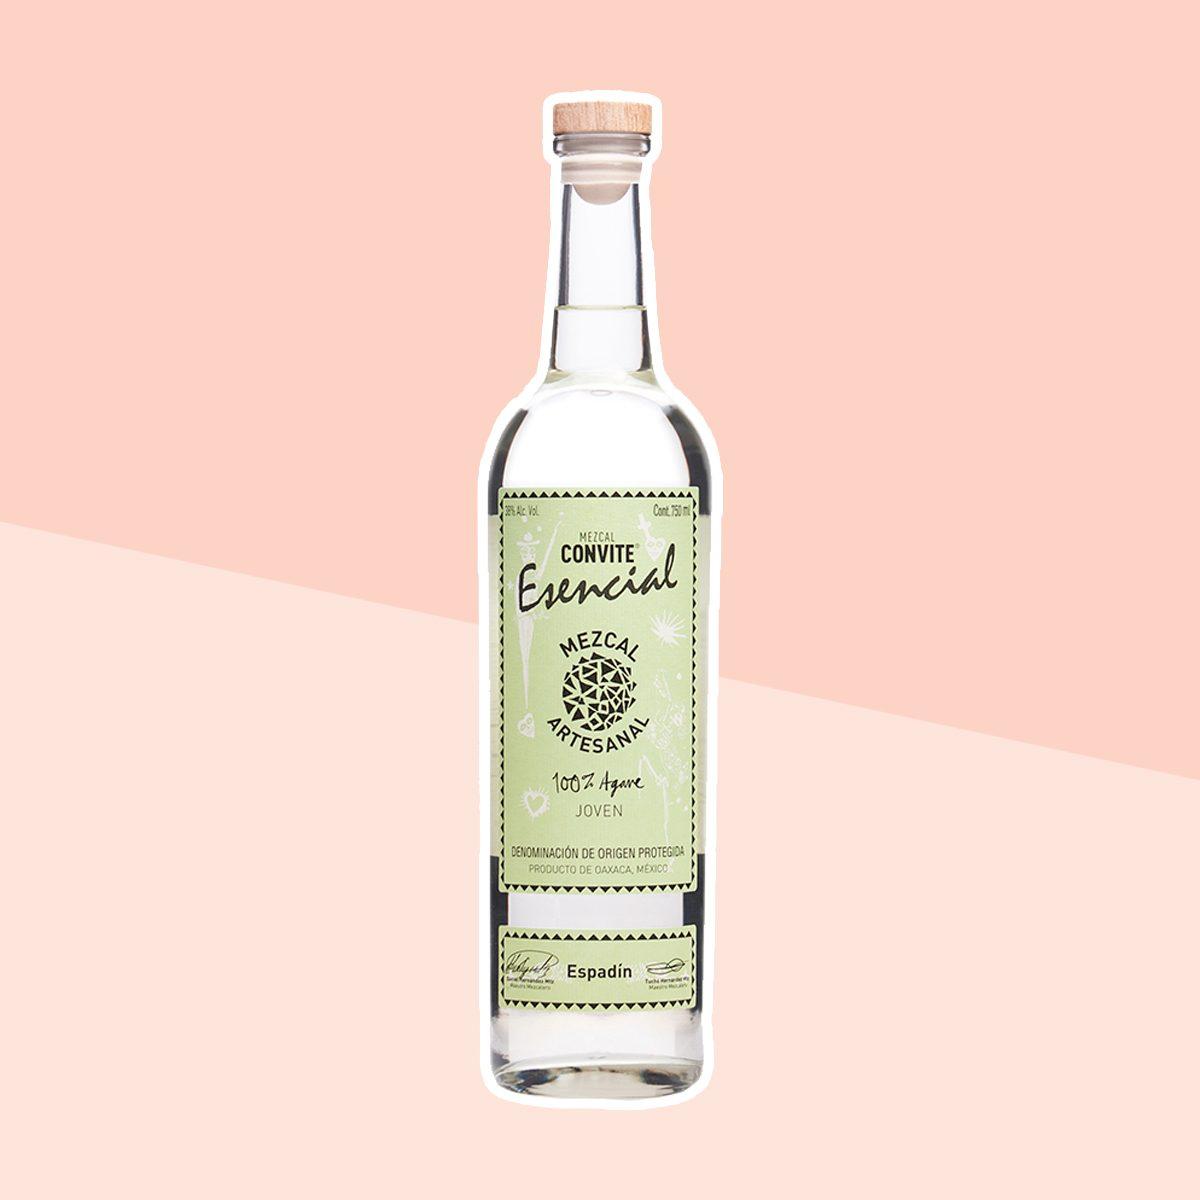 CONVITE MEZCAL Tequila